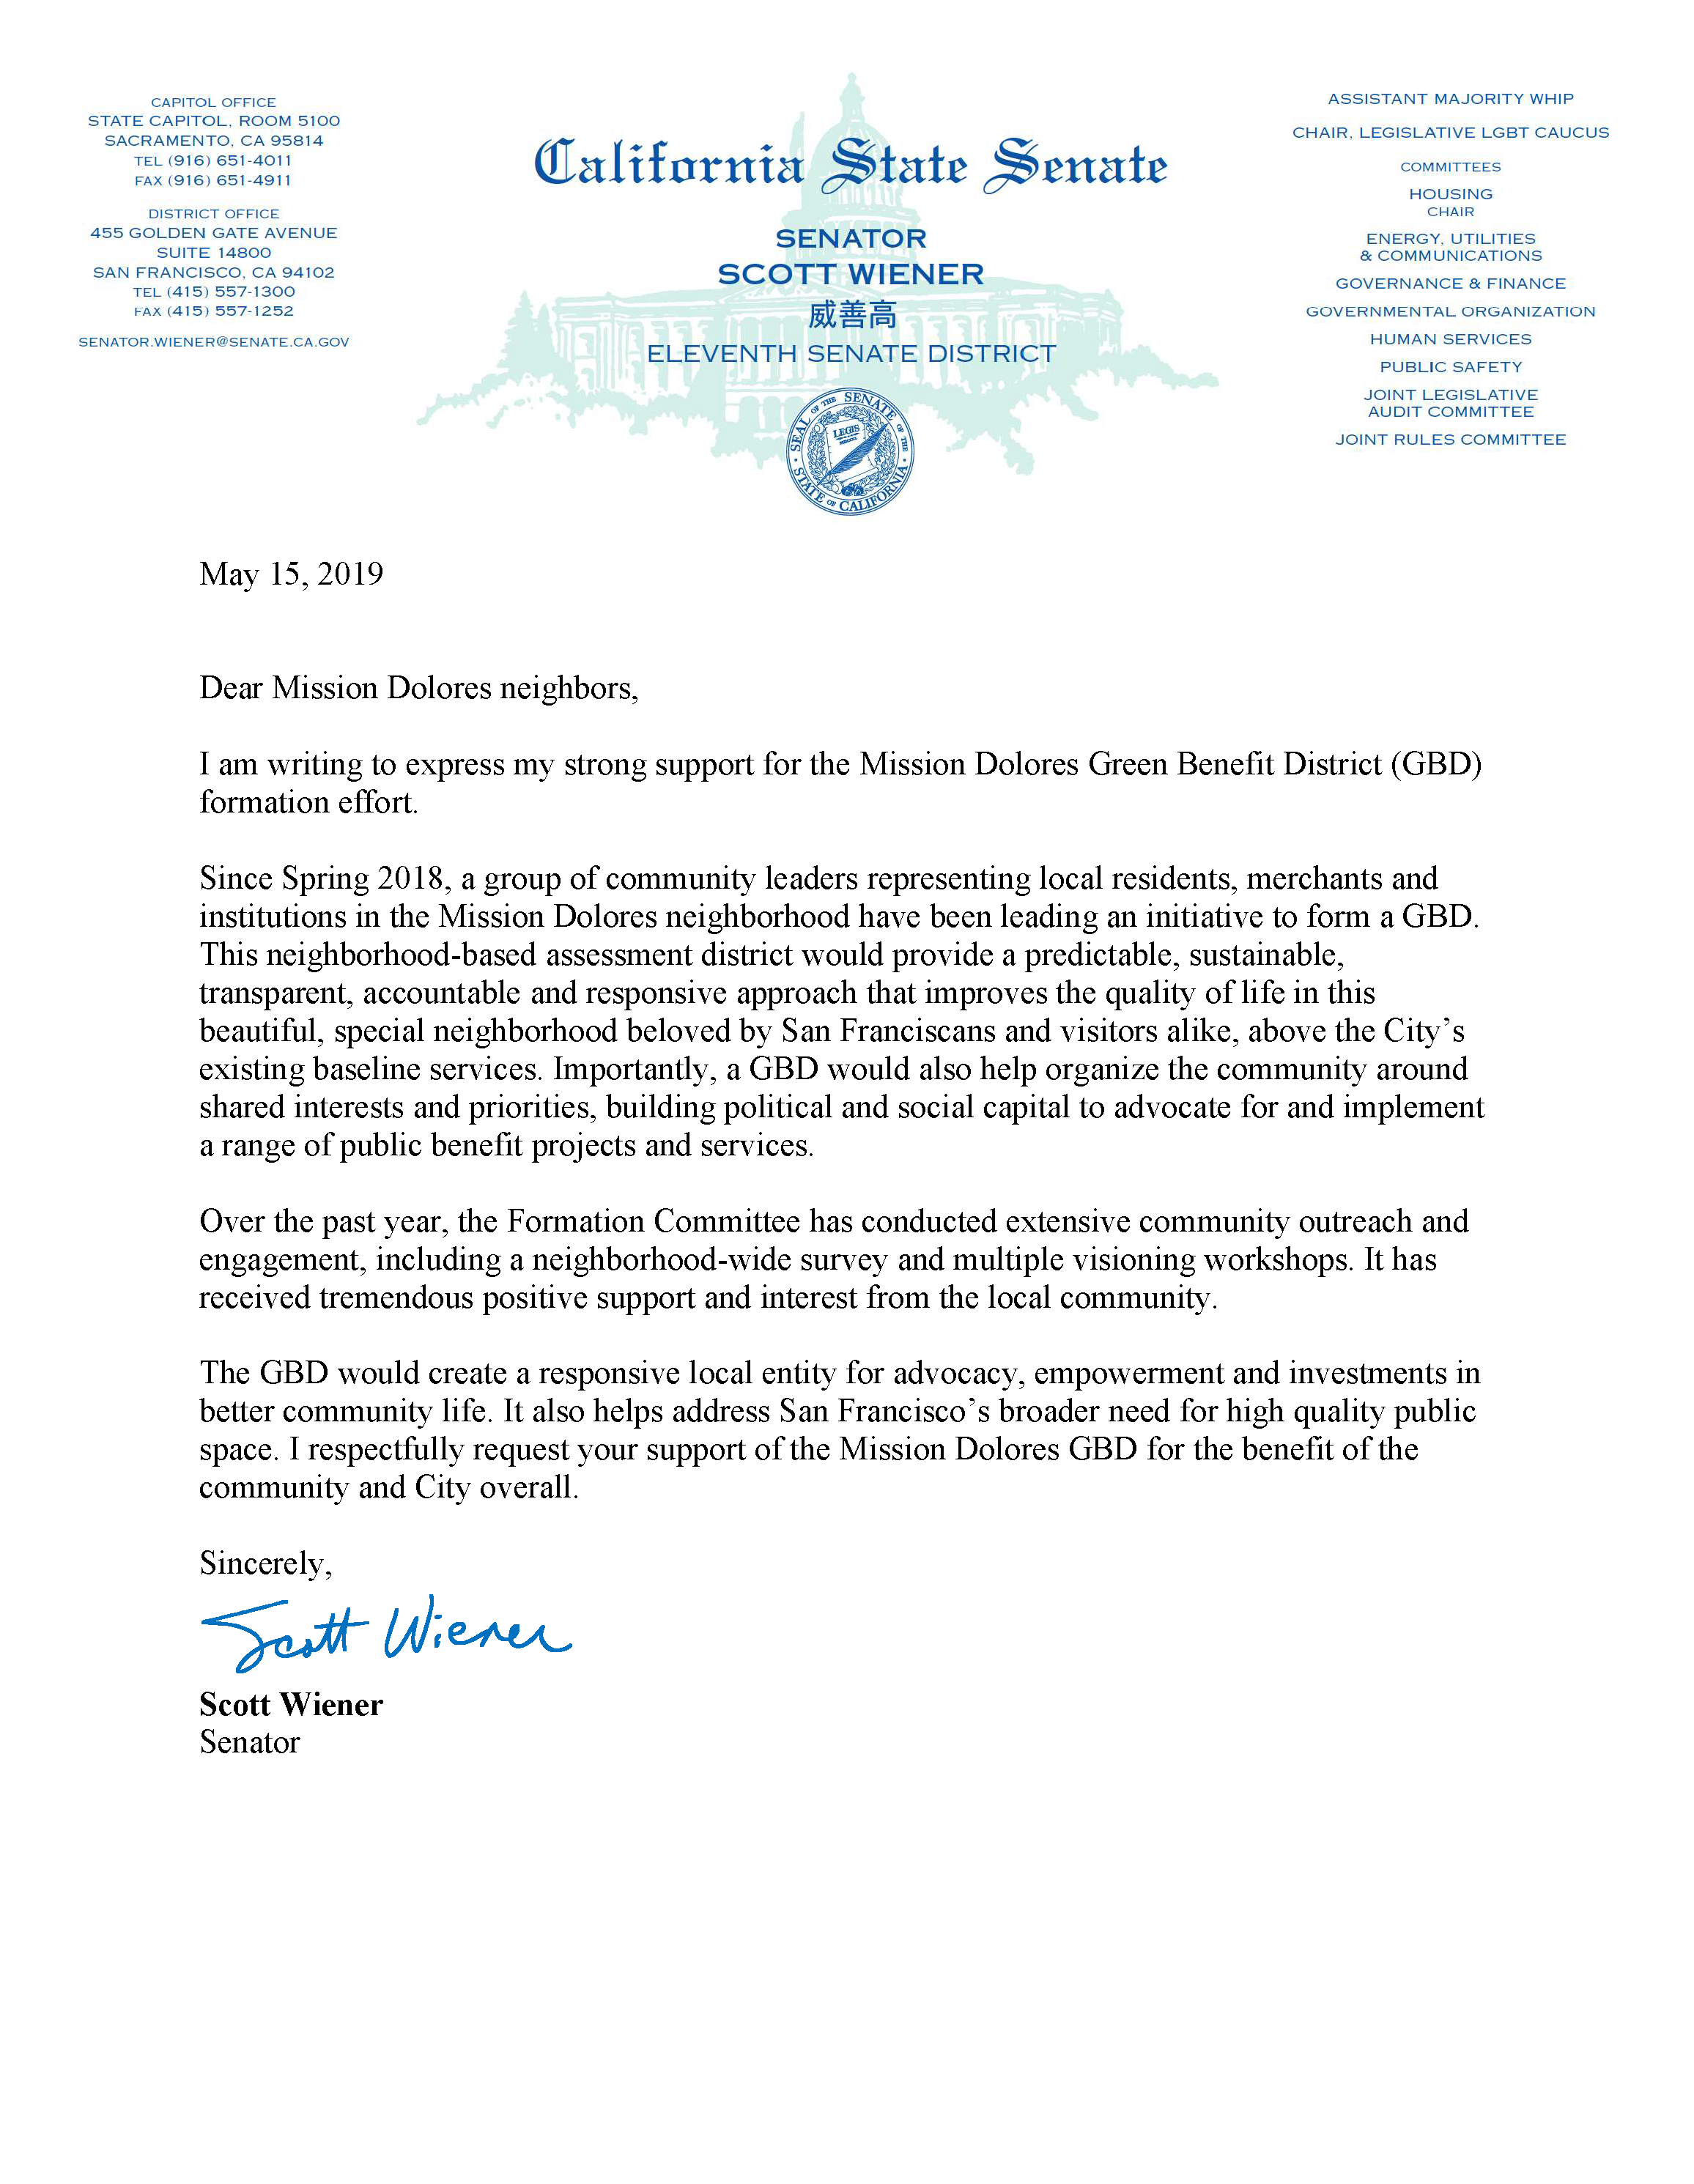 Senator Scott Wiener Letter of Support